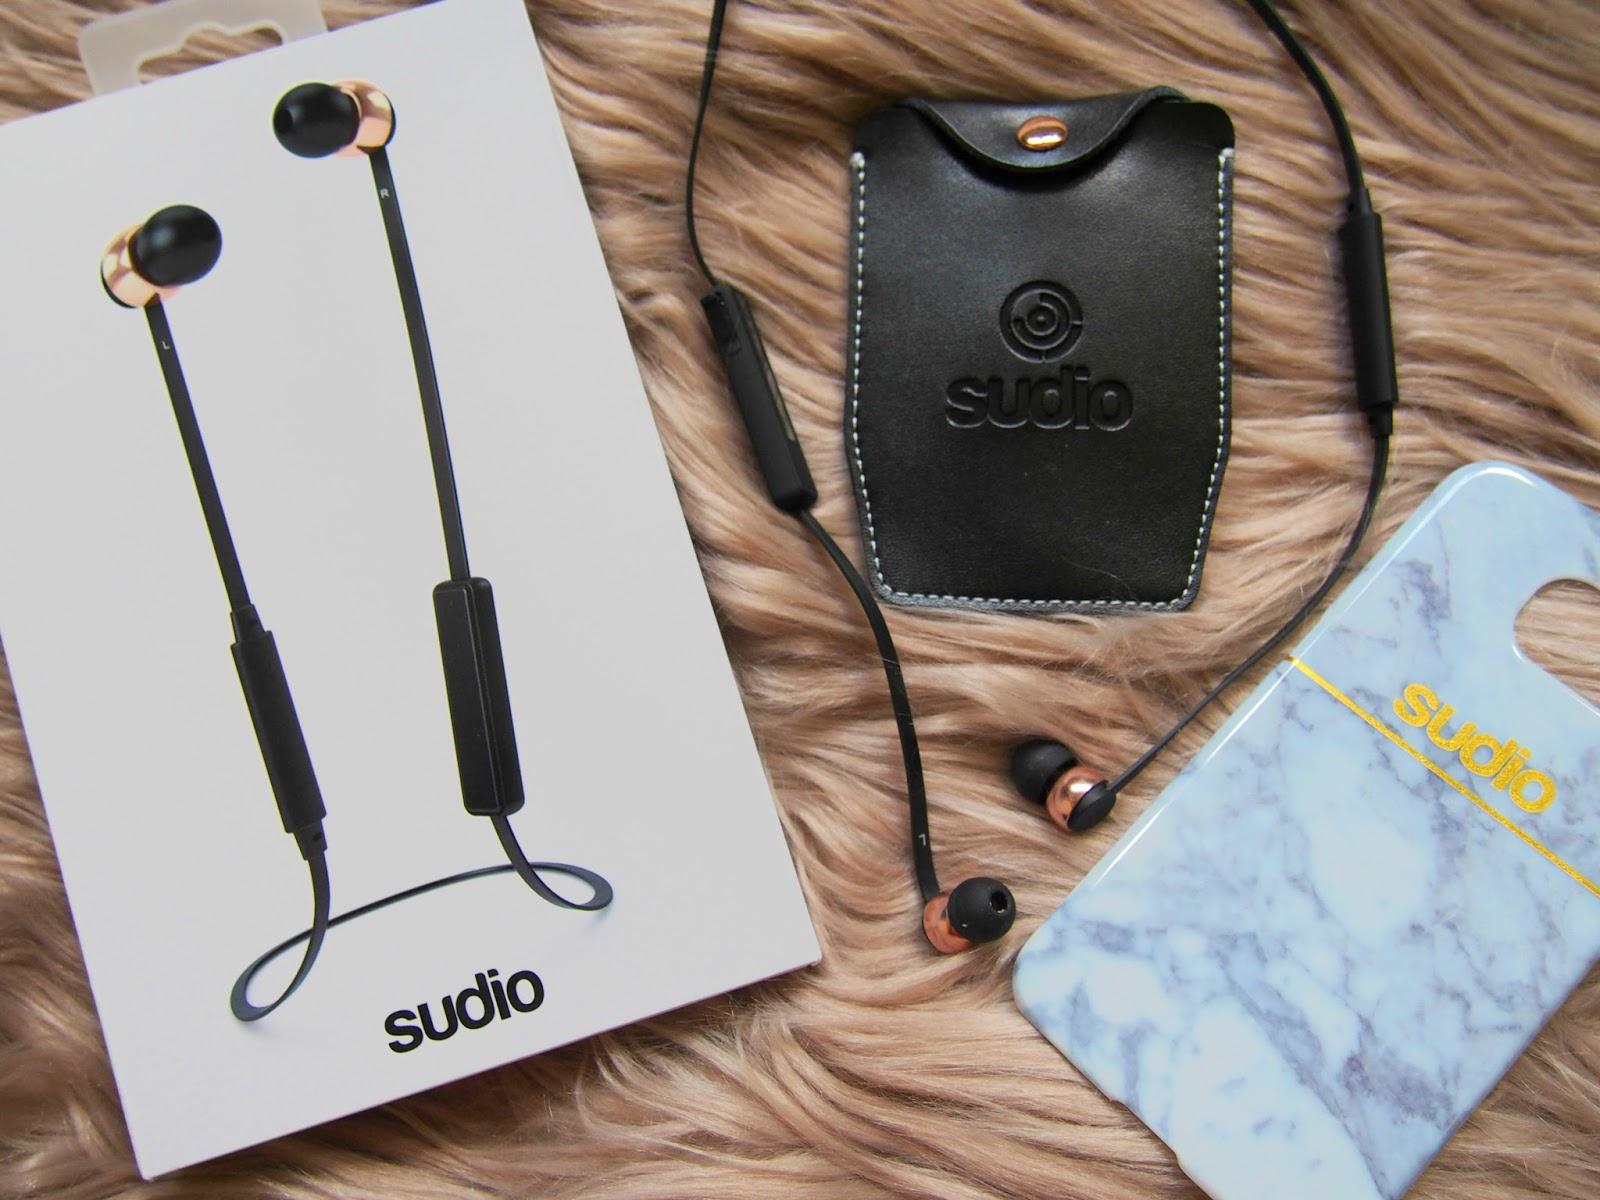 Słuchawki Bluetooth od Sudio